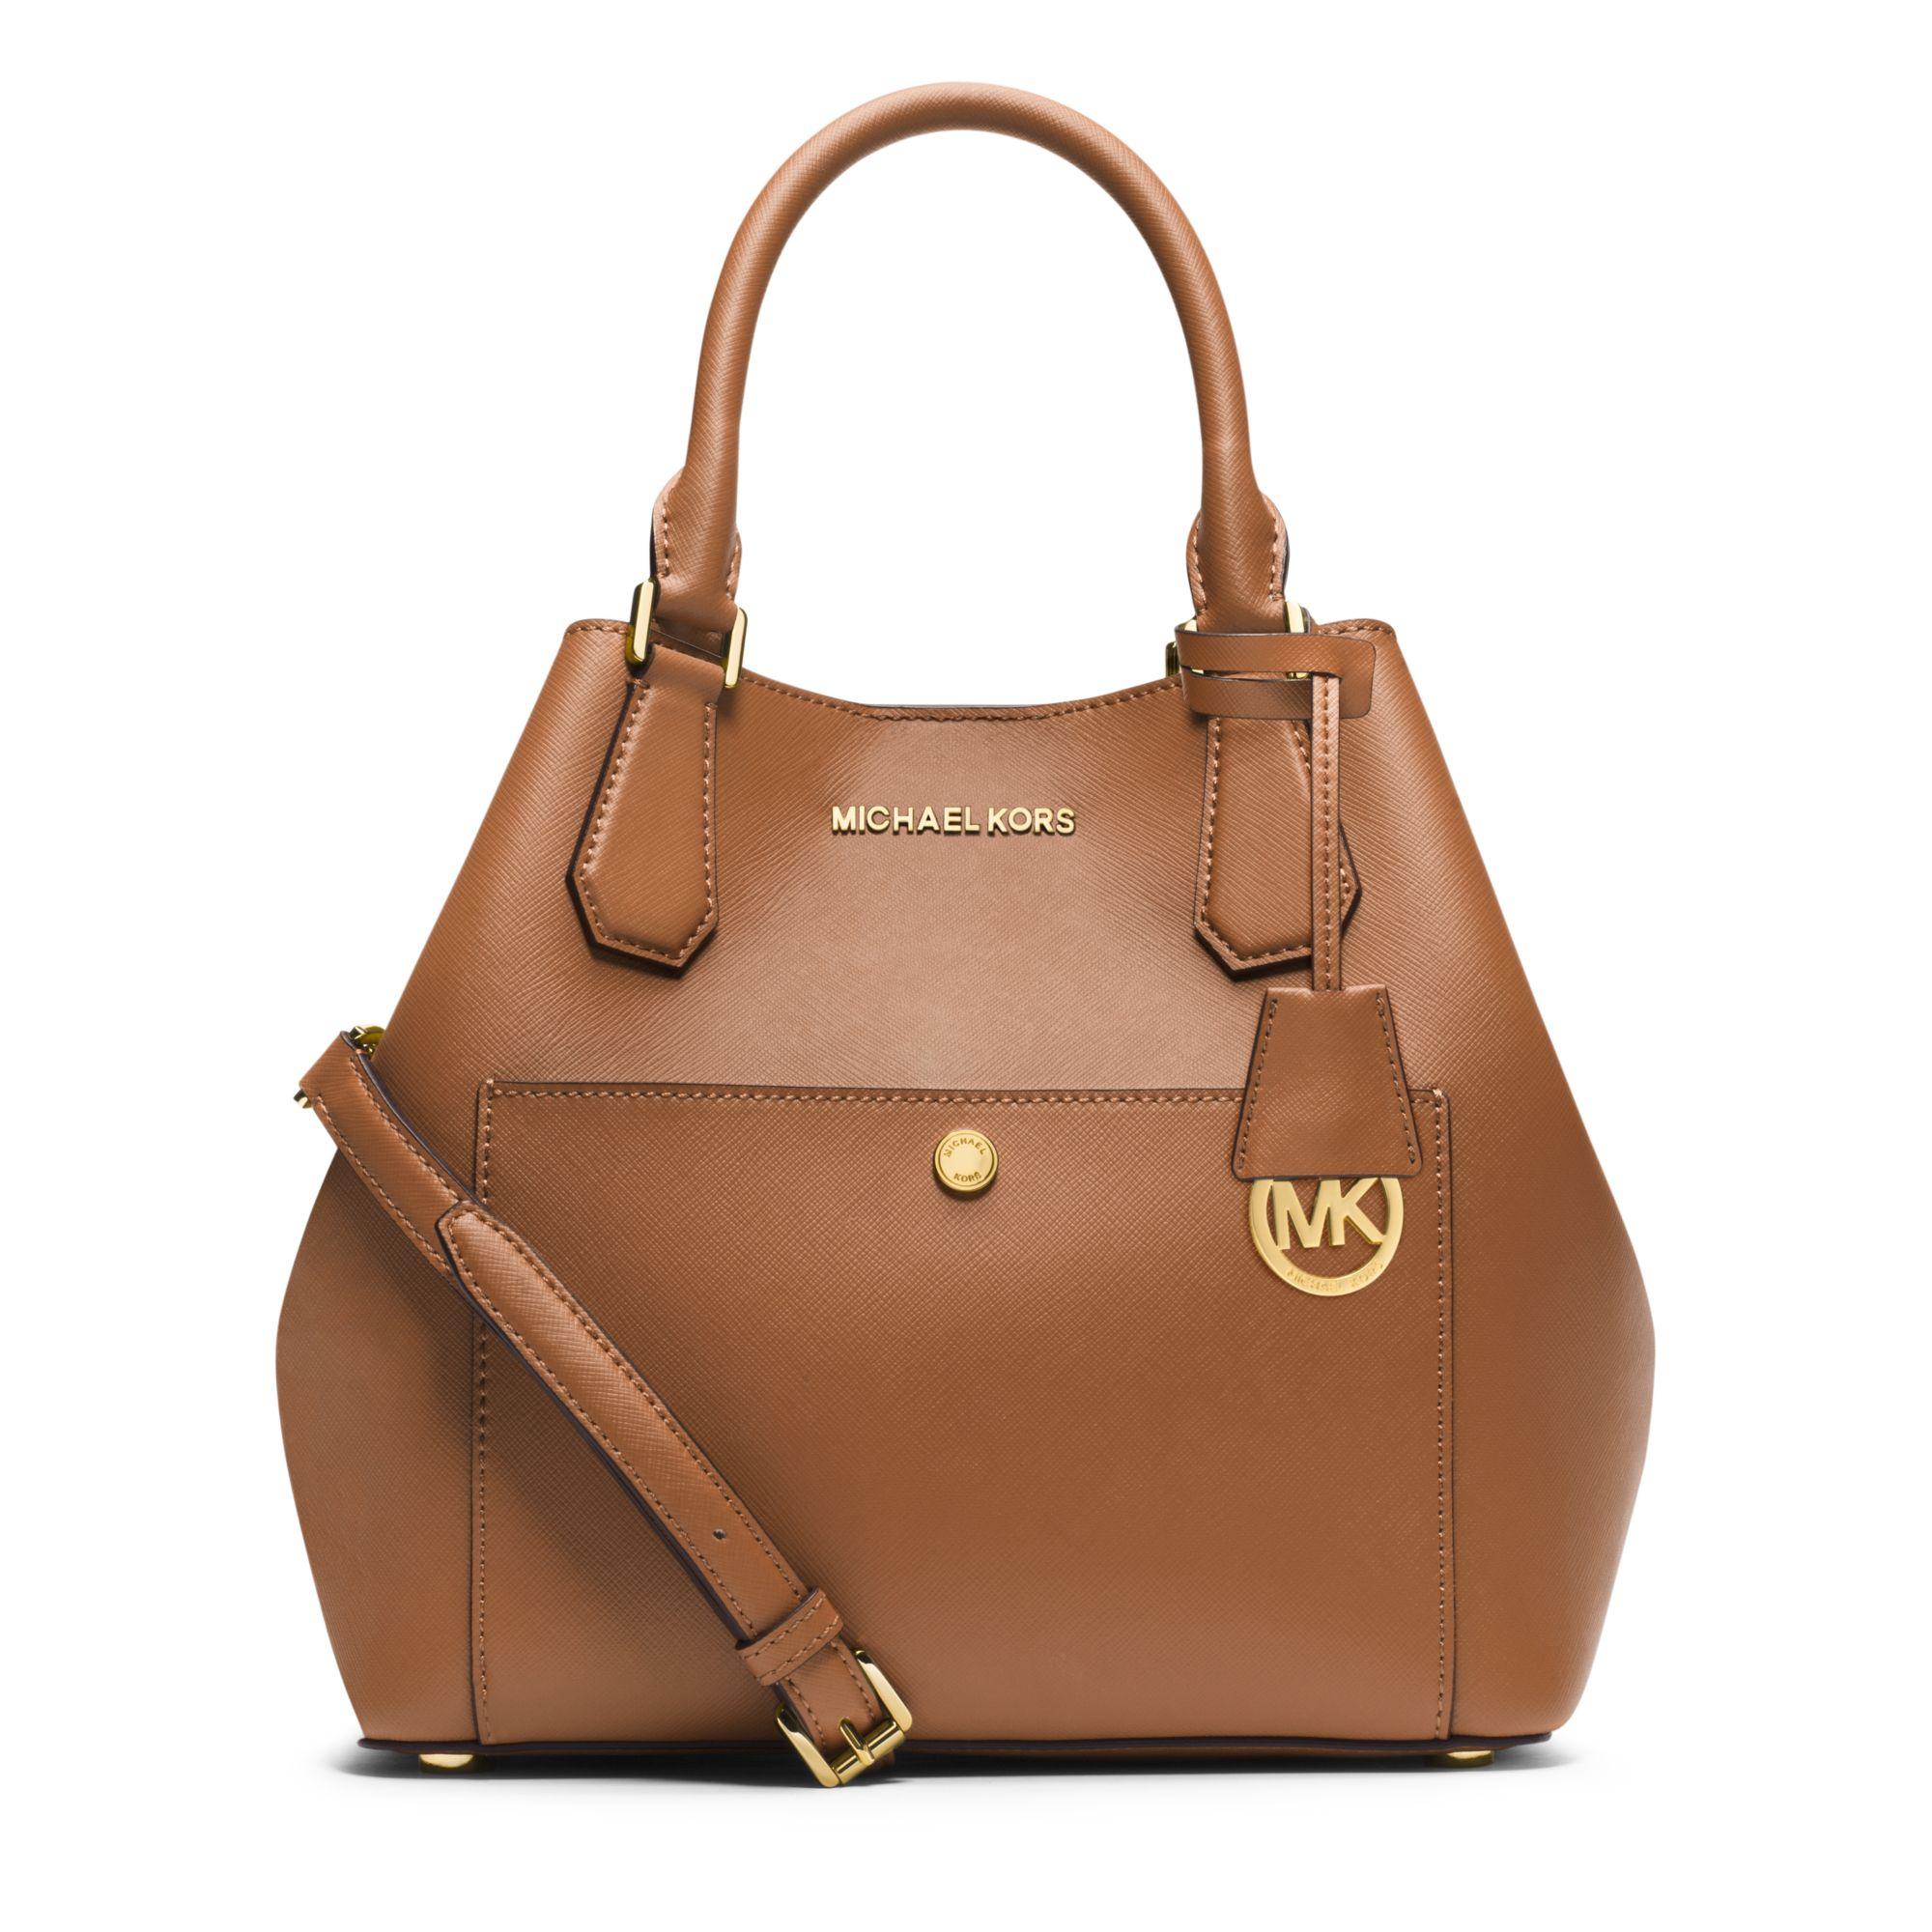 b409cbd60e54 ... canada lyst michael kors greenwich large saffiano leather satchel in  brown 24947 29c8e